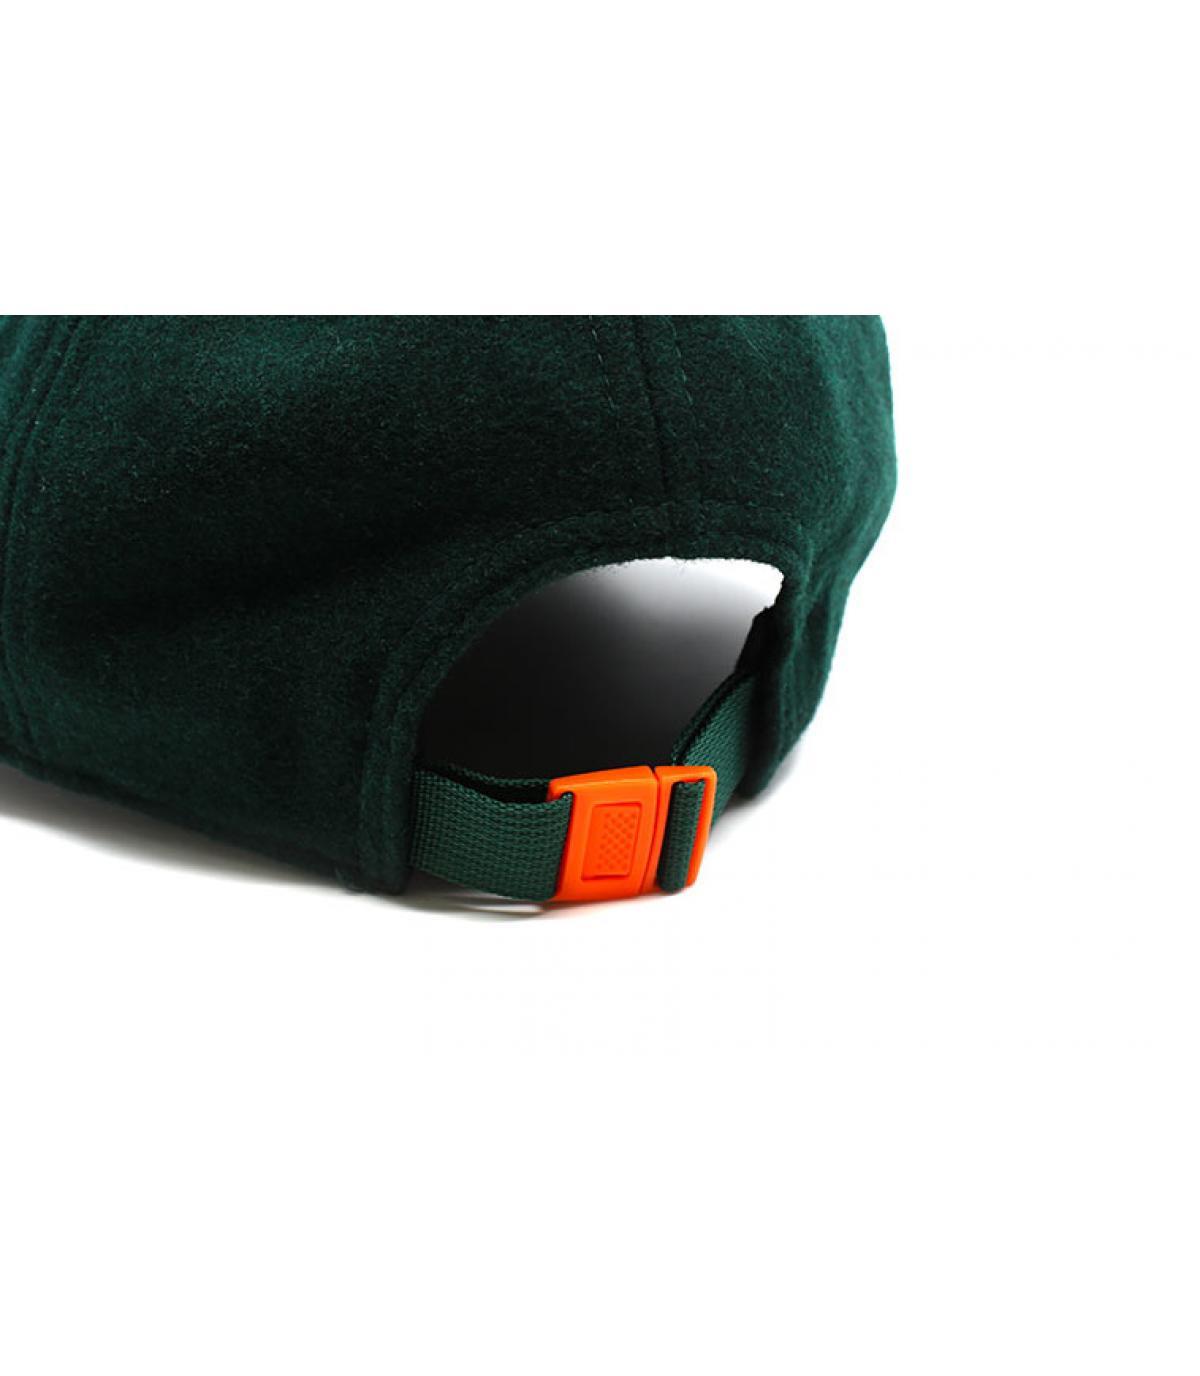 Dettagli Winter Utility Detroit Melton 9Fortydark green orange - image 5